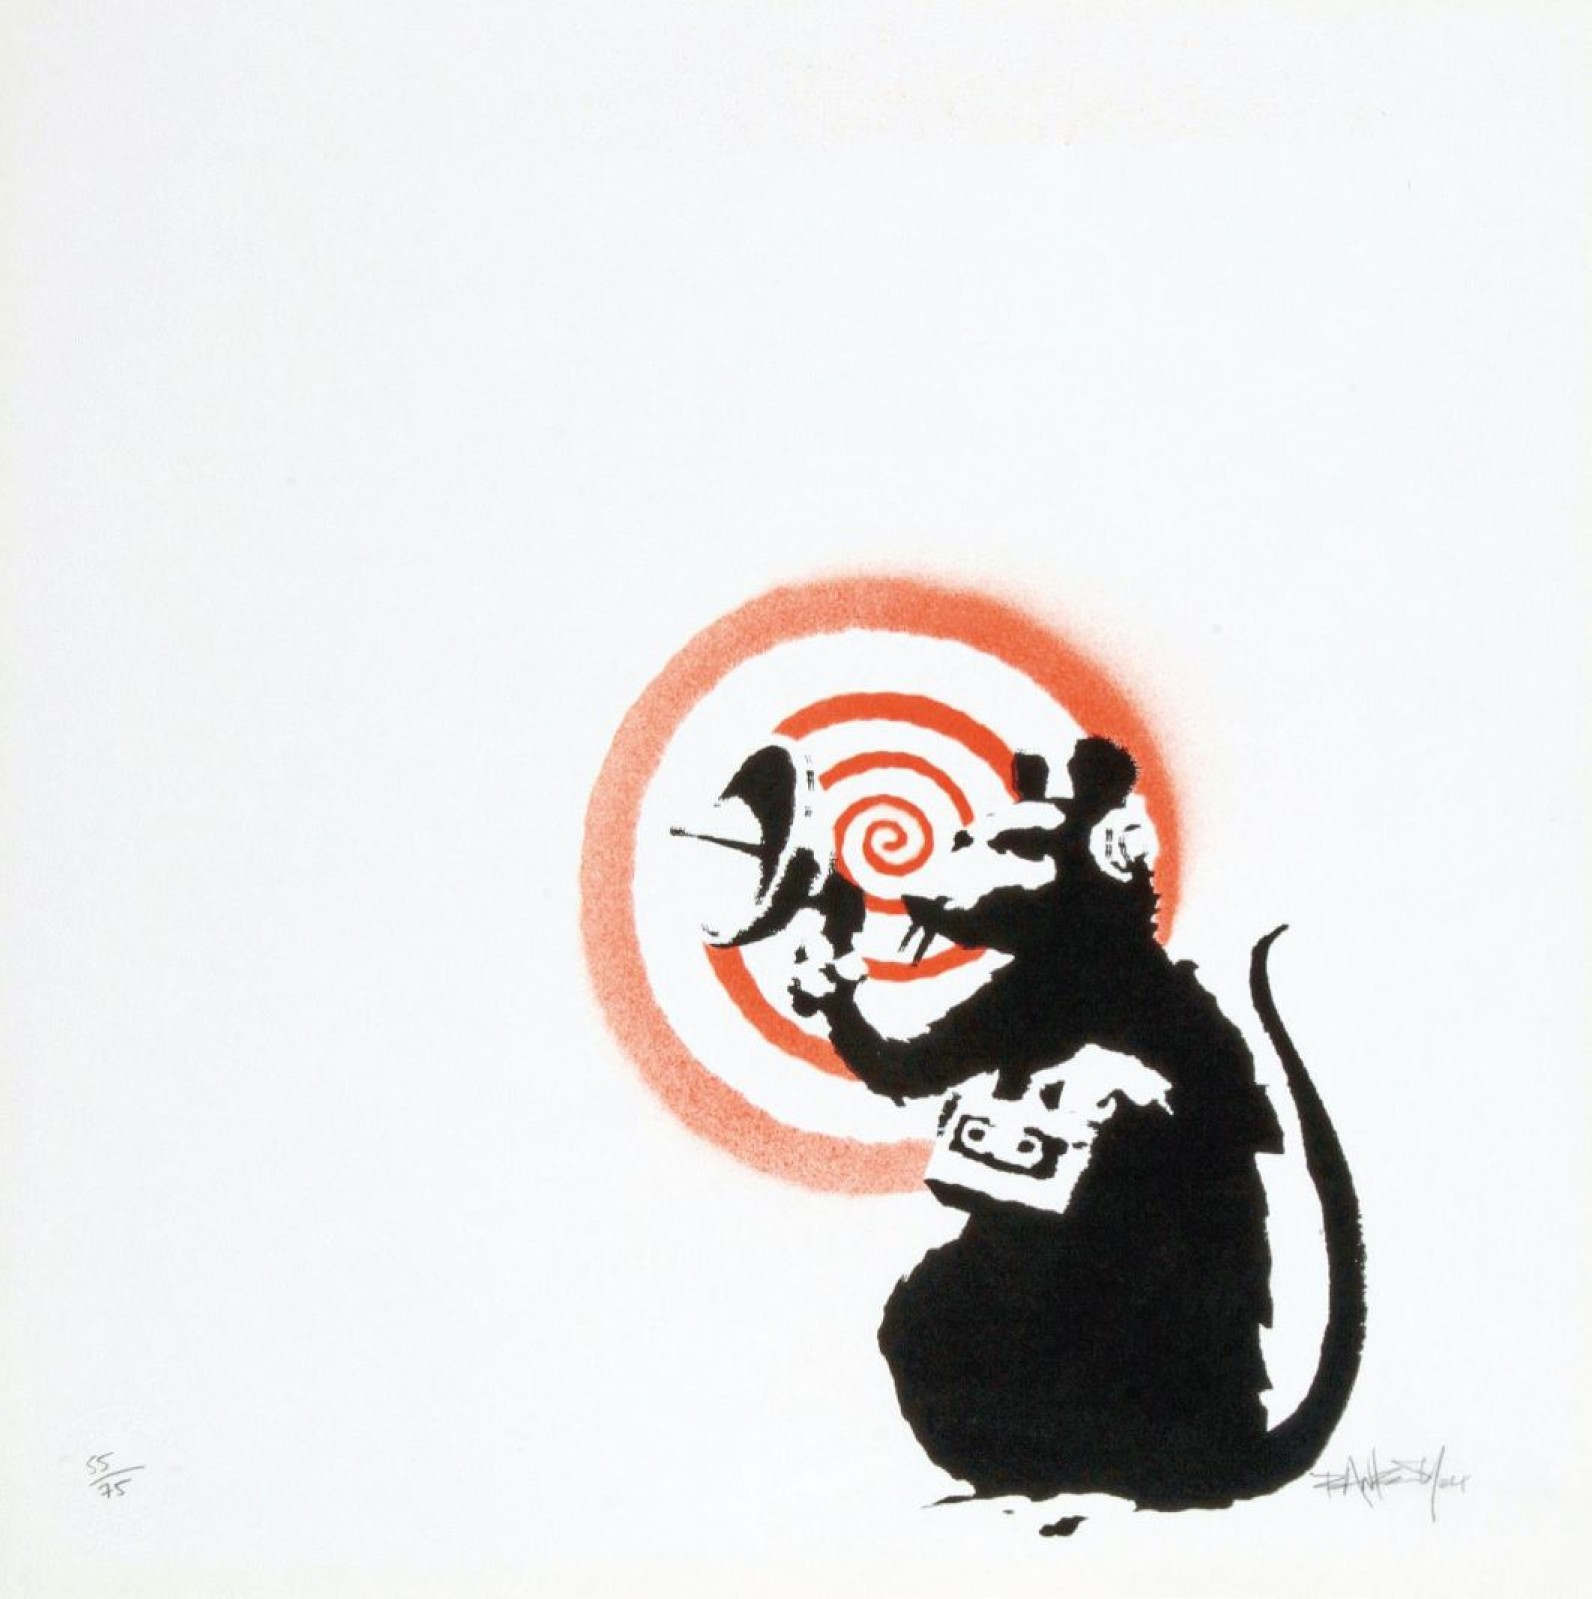 Banksy-Radar Rat-2004